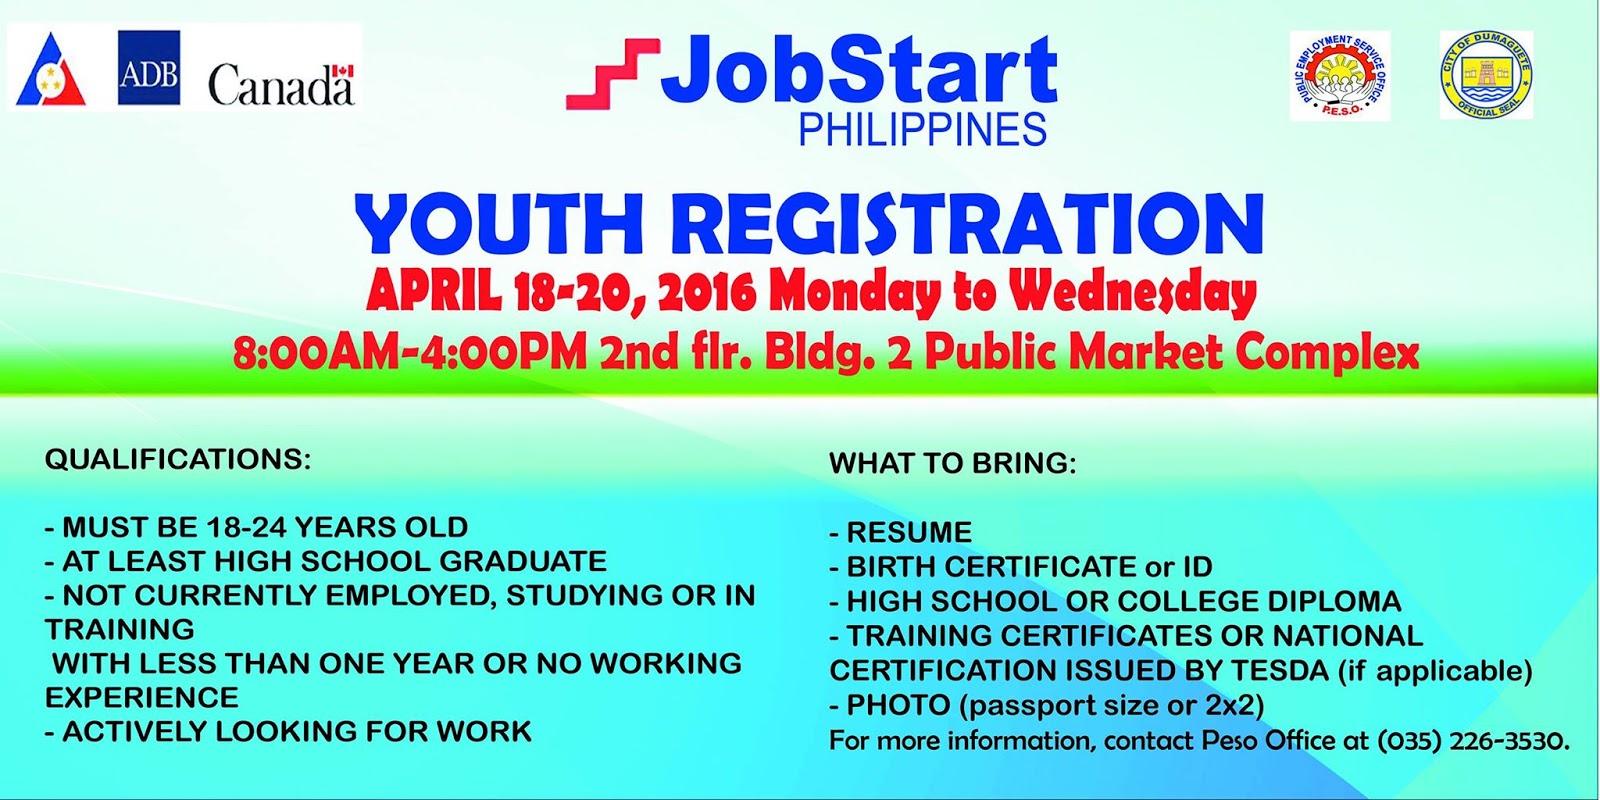 Public employment service office dumaguete city jobstart jobstart philippines program aiddatafo Image collections